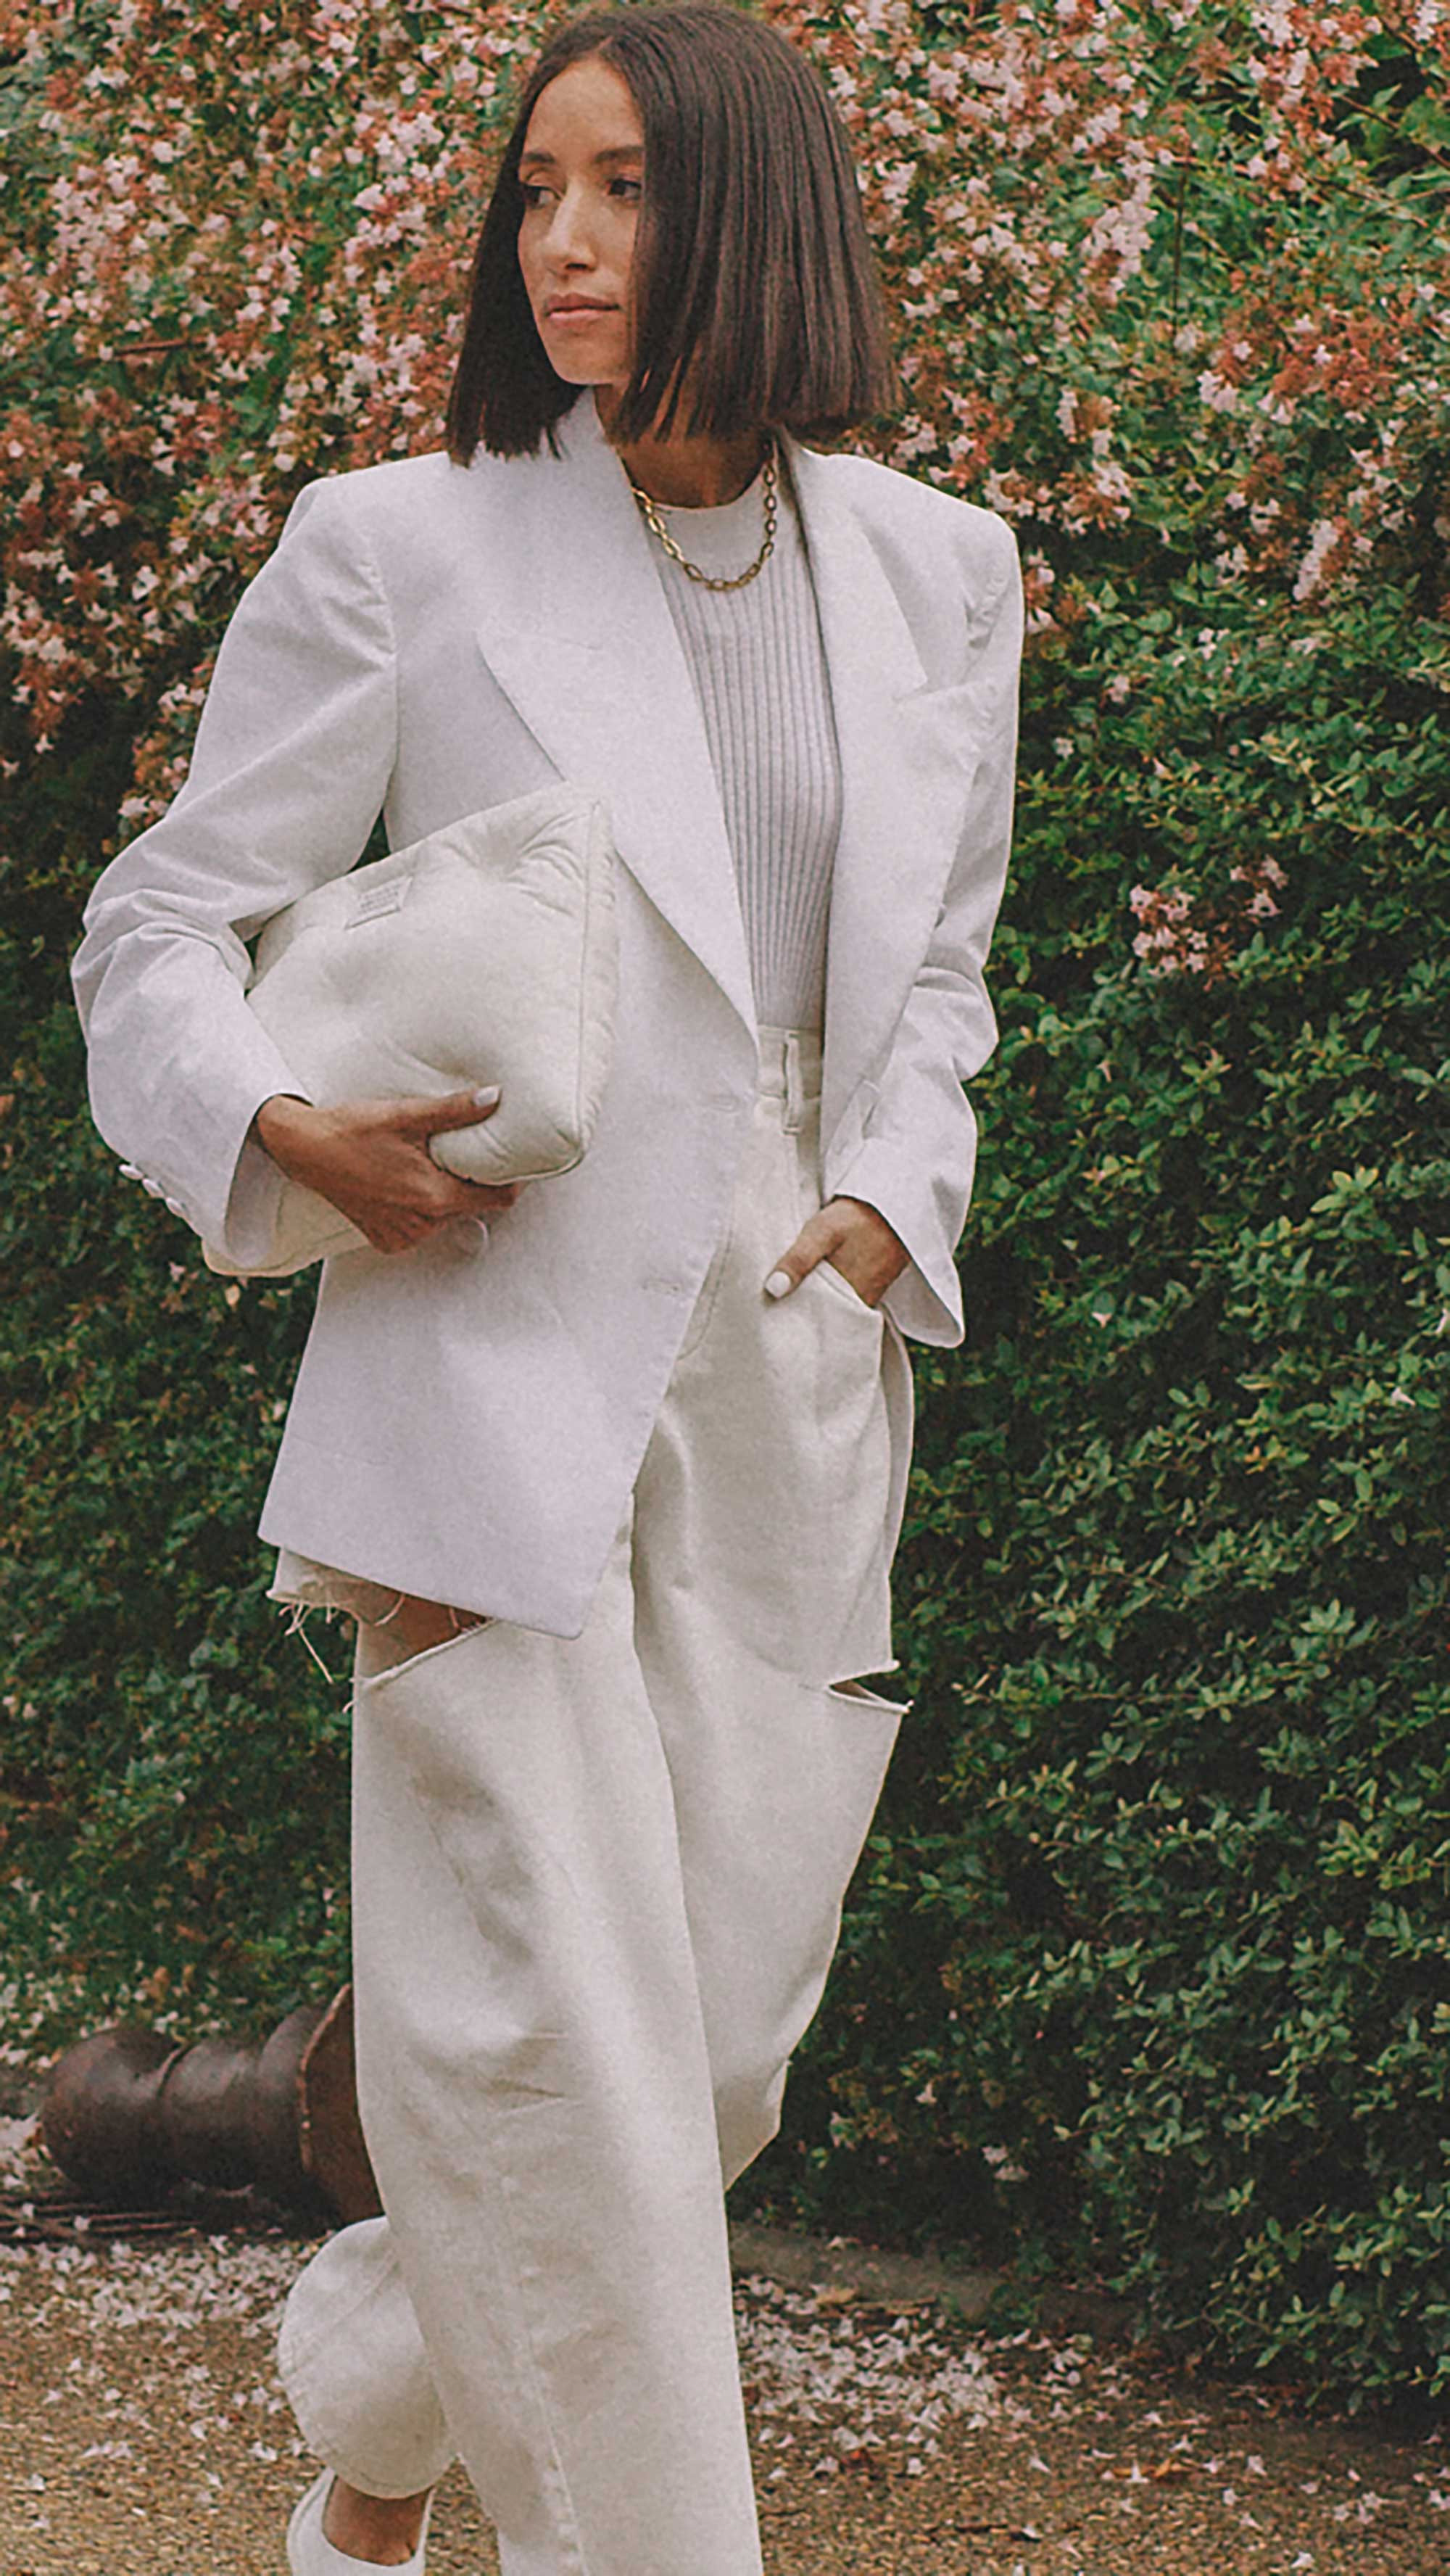 Best outfits of Paris Fashion Week street style 2019 day two PFW SS20 Photo by @J2martinez Jose J. Martinez -17.jpg